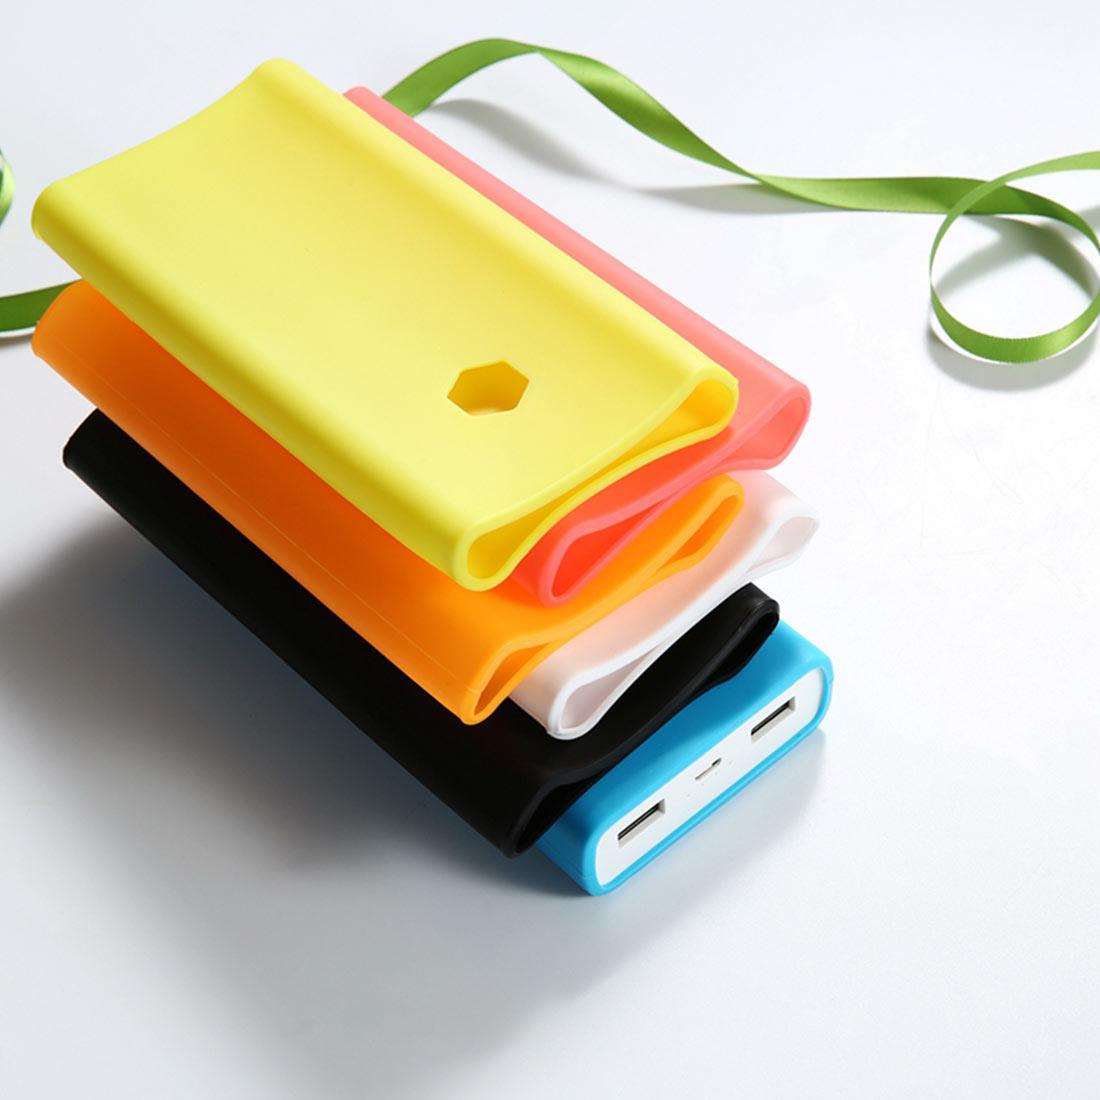 For Xiaomi Power Bank 2C 20000 mAh Power bank Case Rubber Sleeve Silicone Protective Case For Xiaomi Power bank Cover